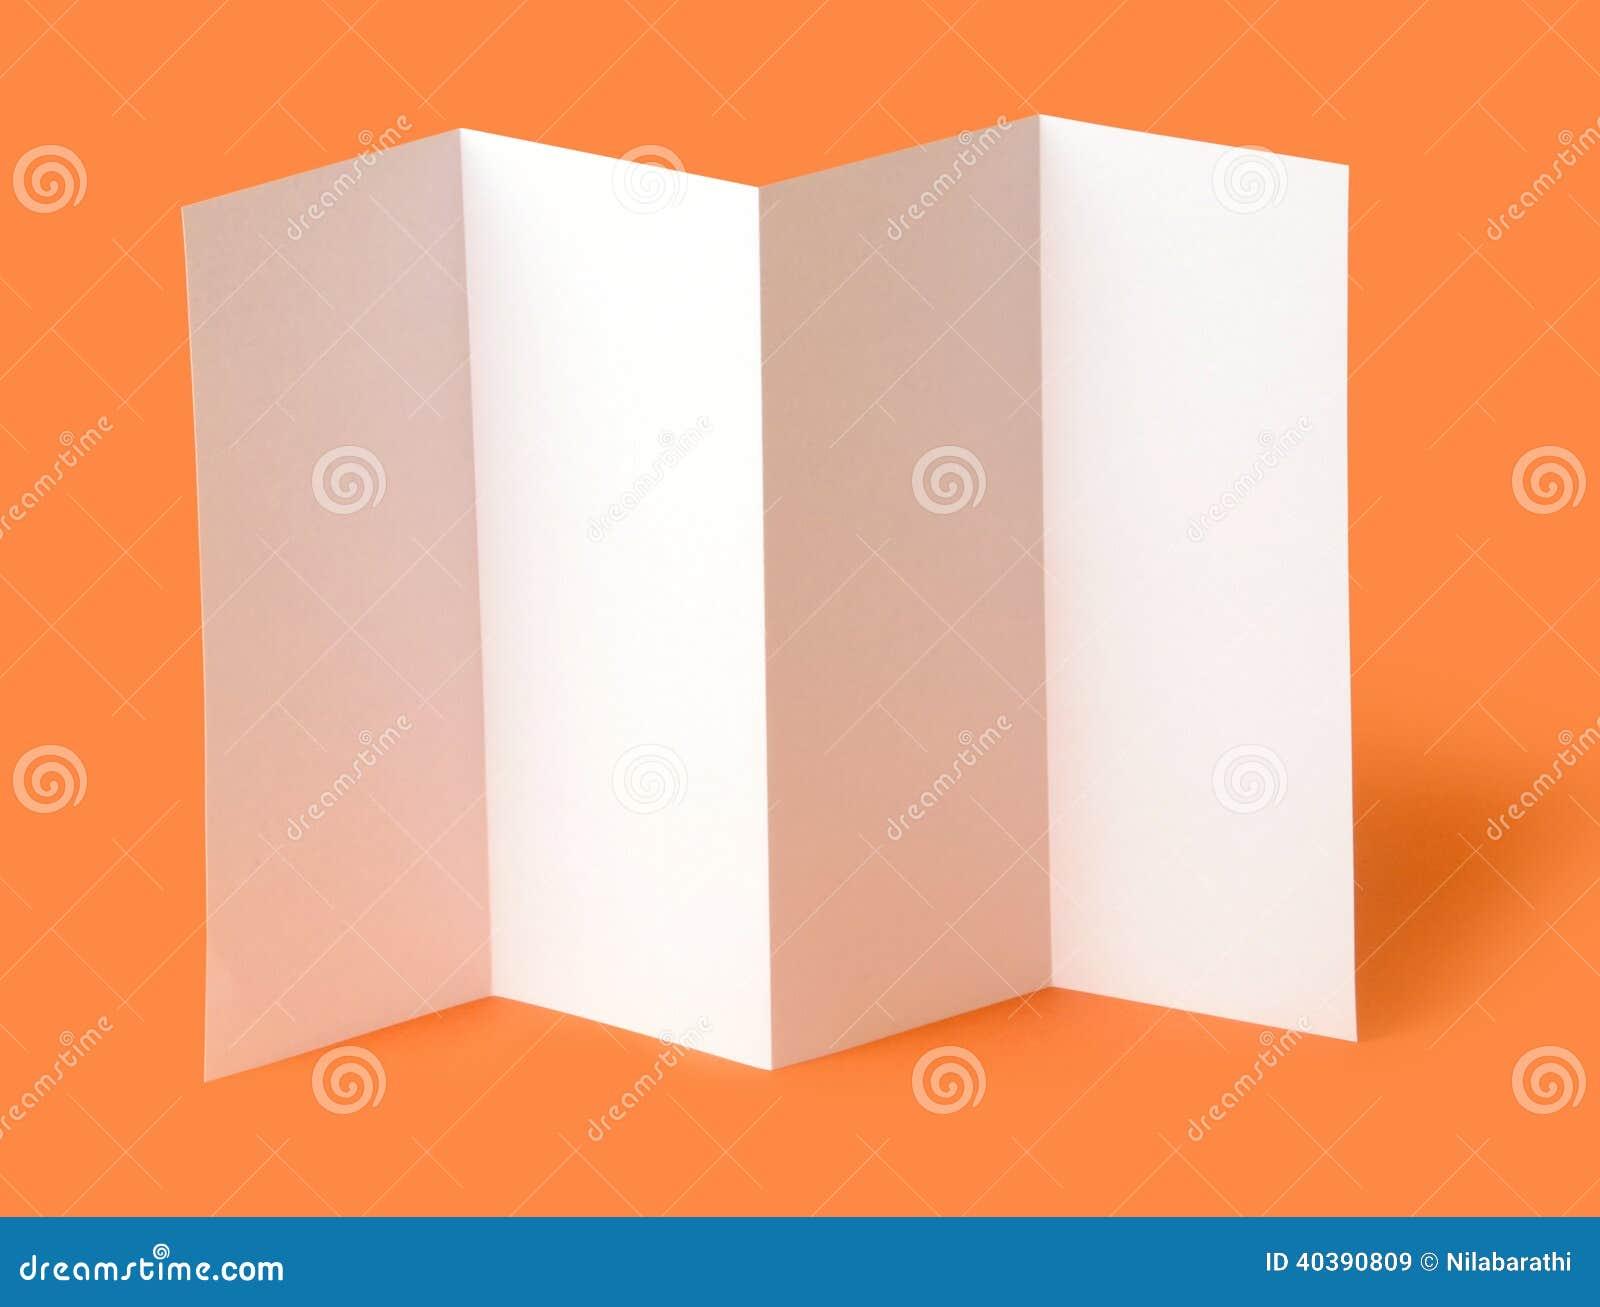 blank travel brochure template - blank brochure stock photo image 40390809